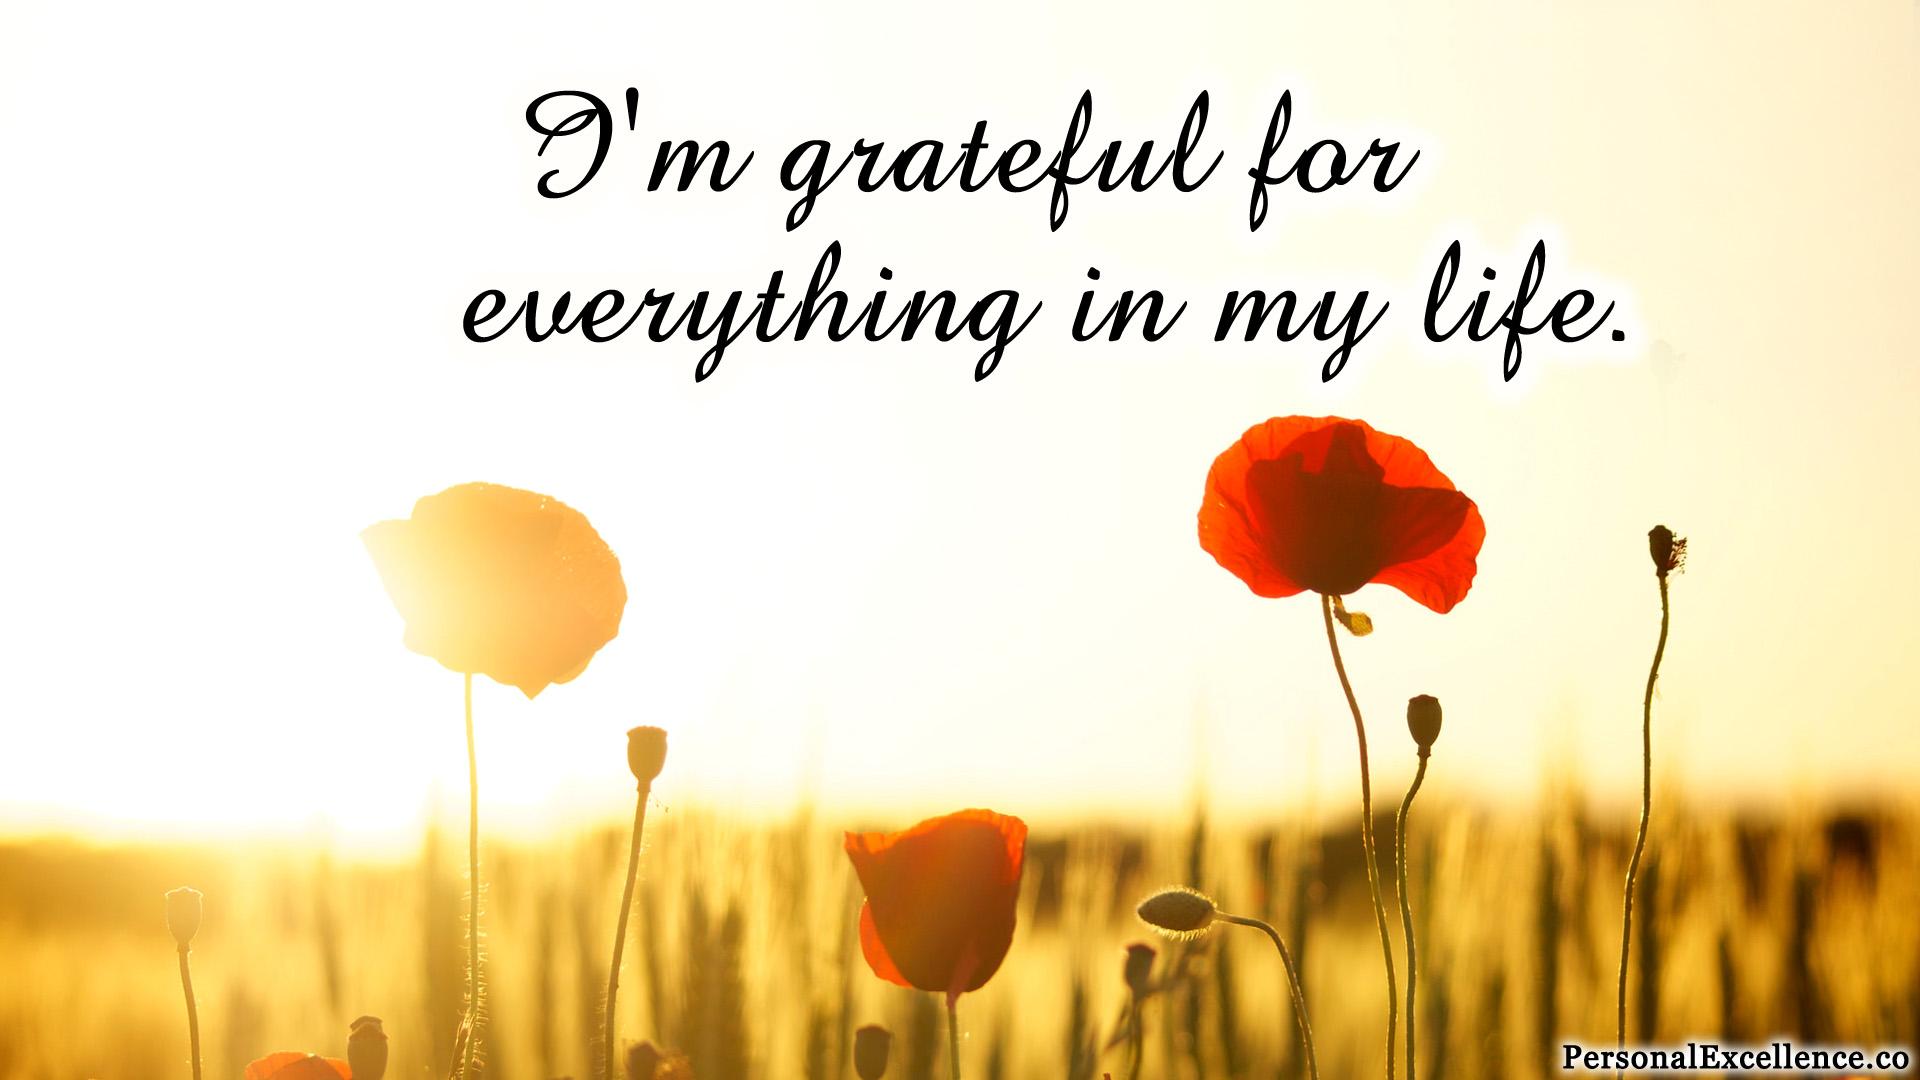 5. [Gratitude] Wallpaper